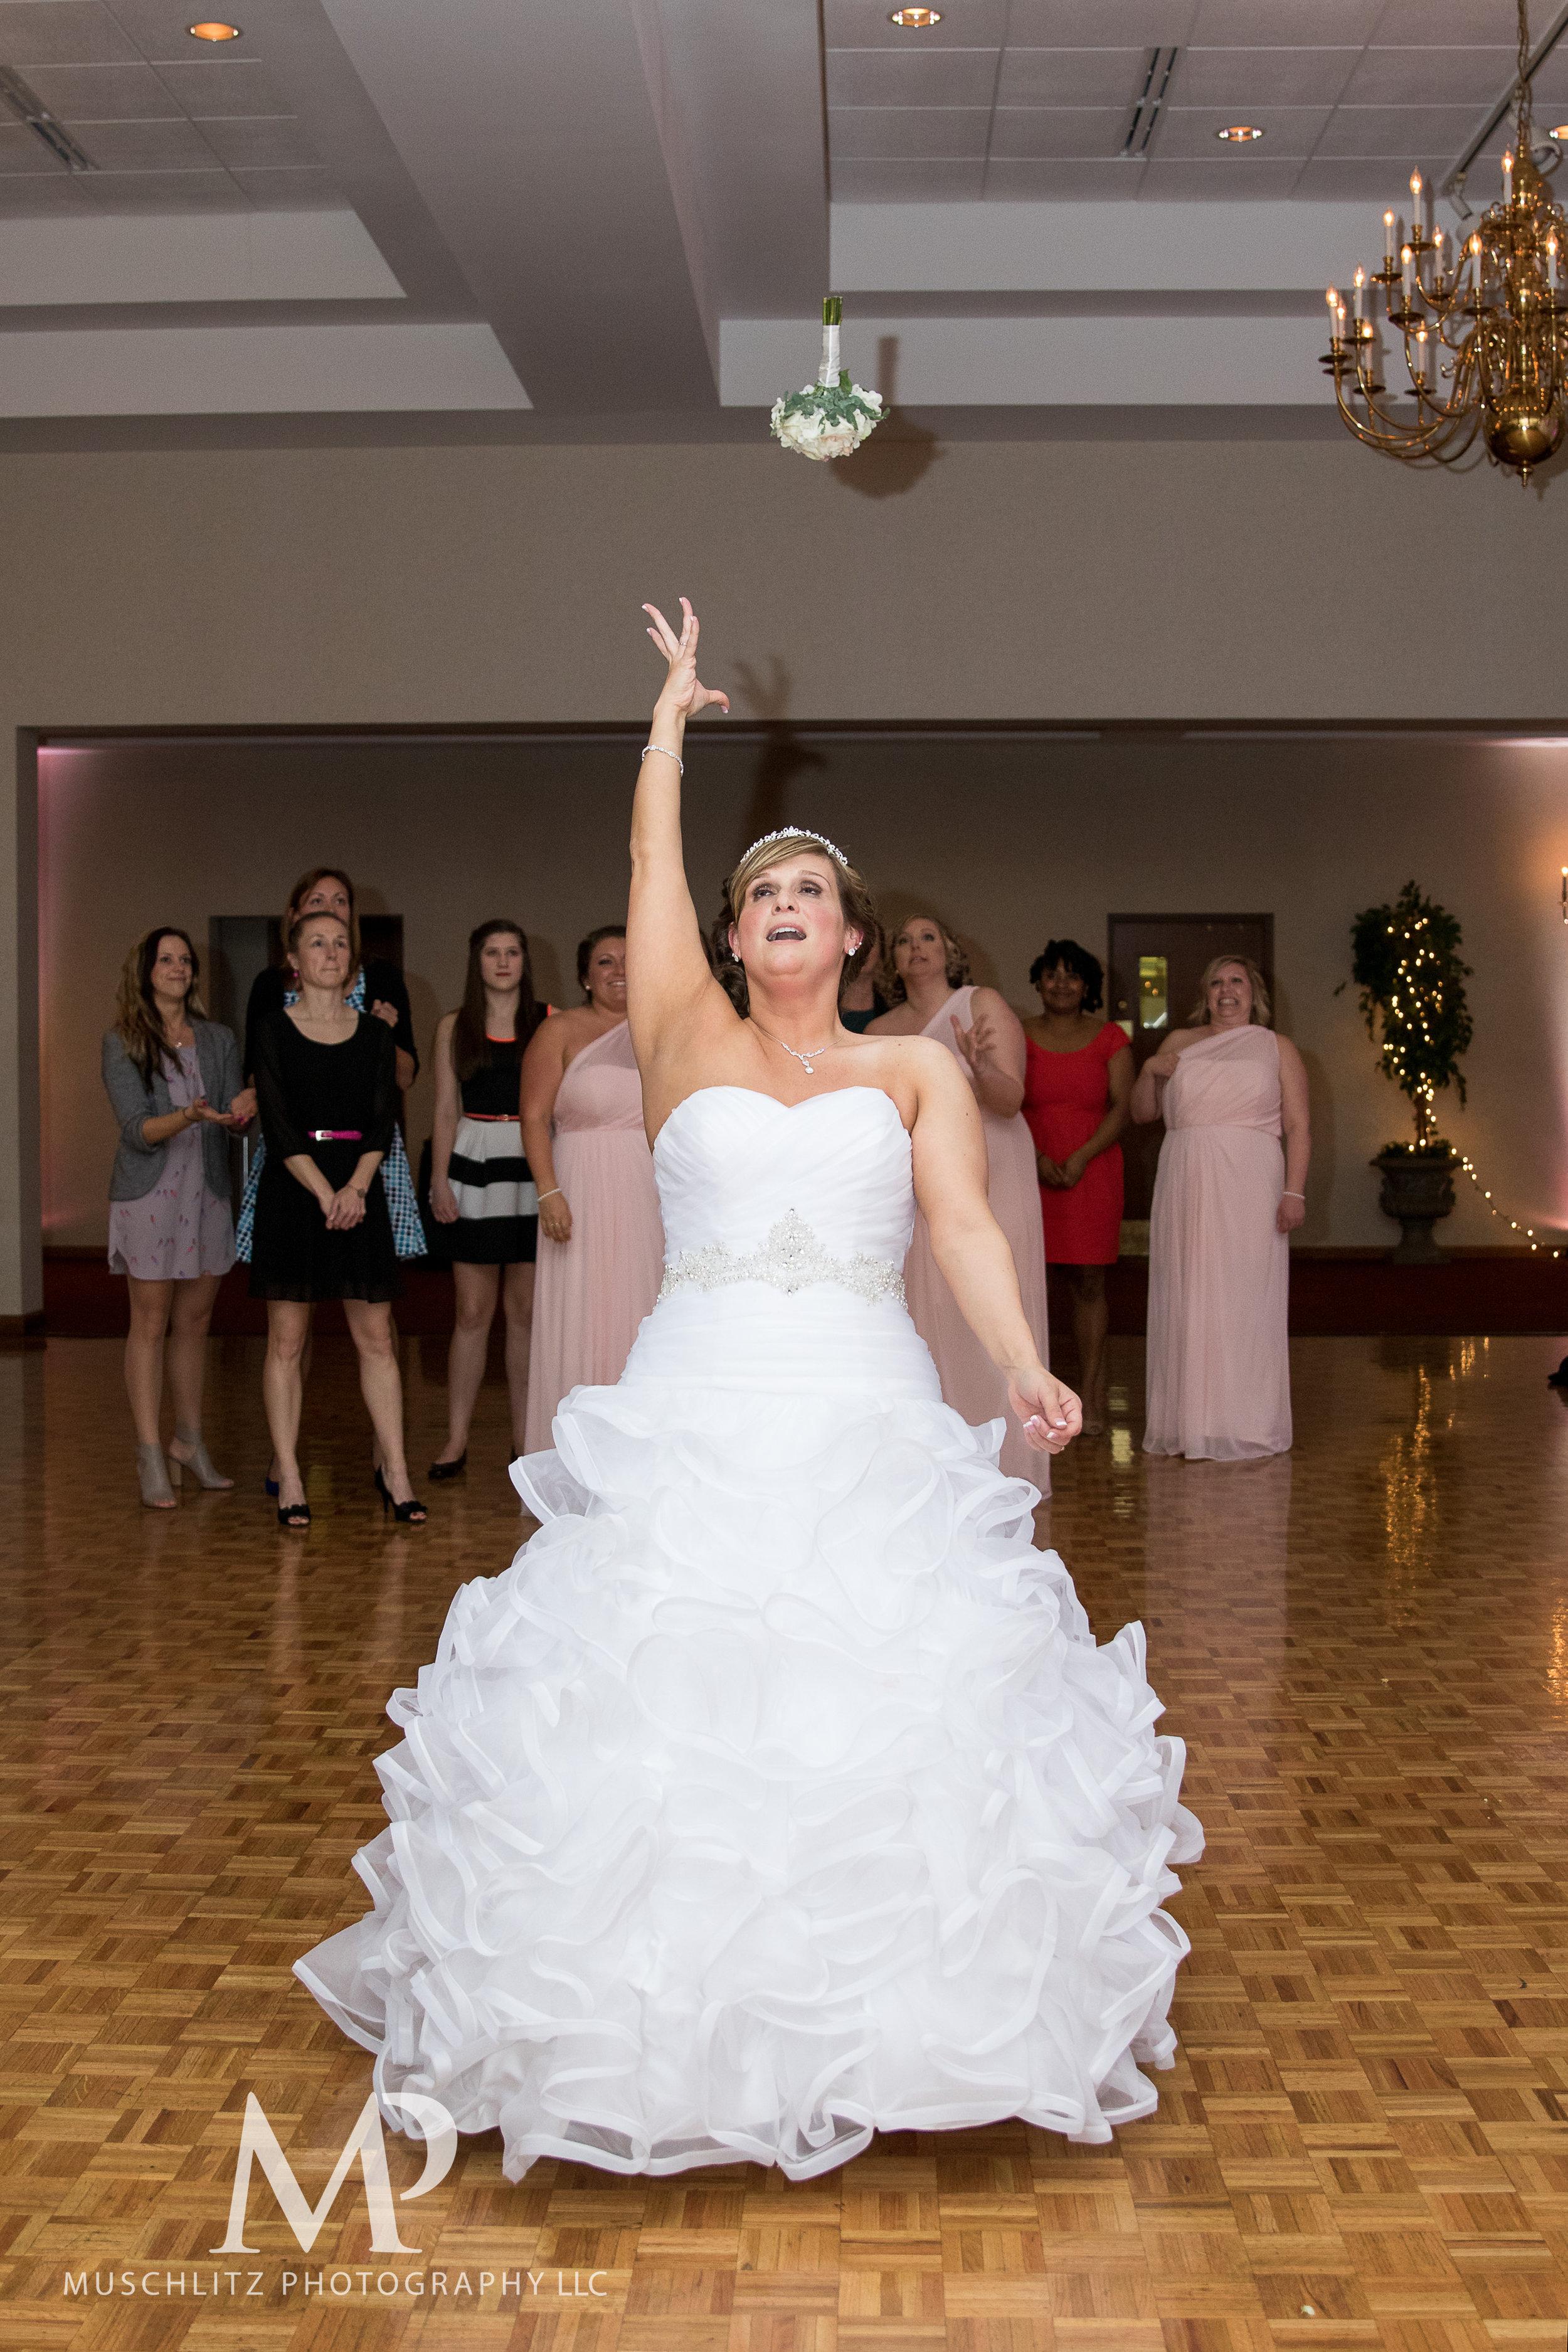 annunciation-banquet-conference-center-downtown-columbus-wedding-reception-downtown-columbus-ohio-muschlitz-photography-025.JPG